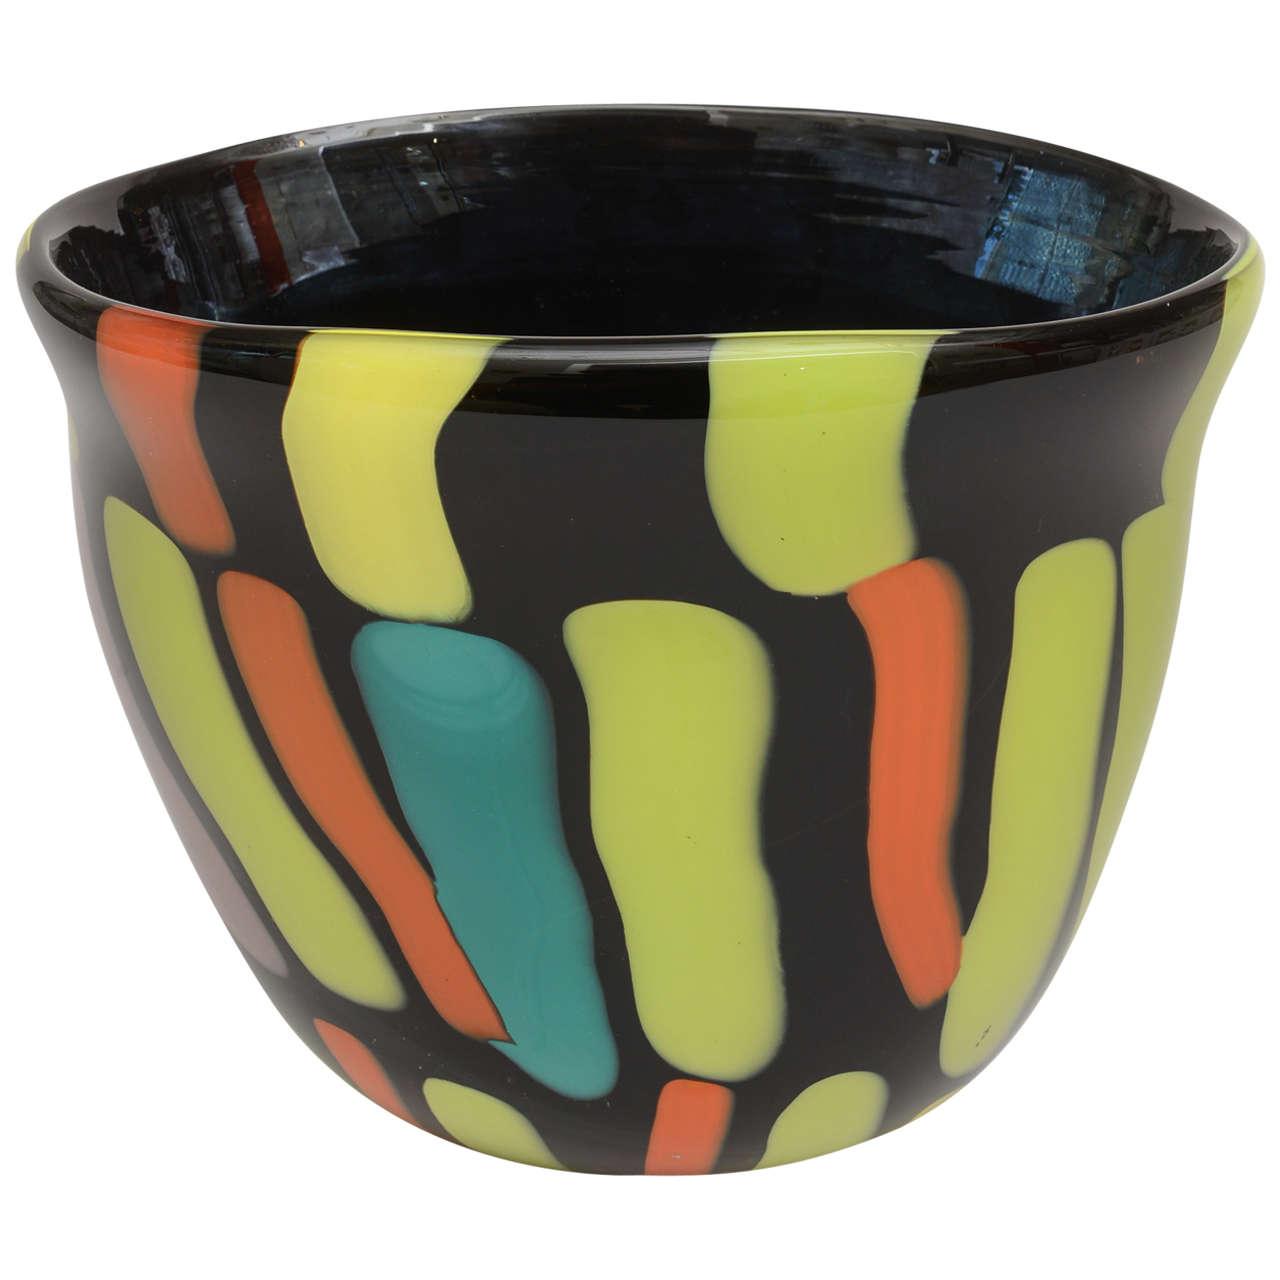 Signed Italian Murano Fratelli Pagnin Glass Vase or Vessel